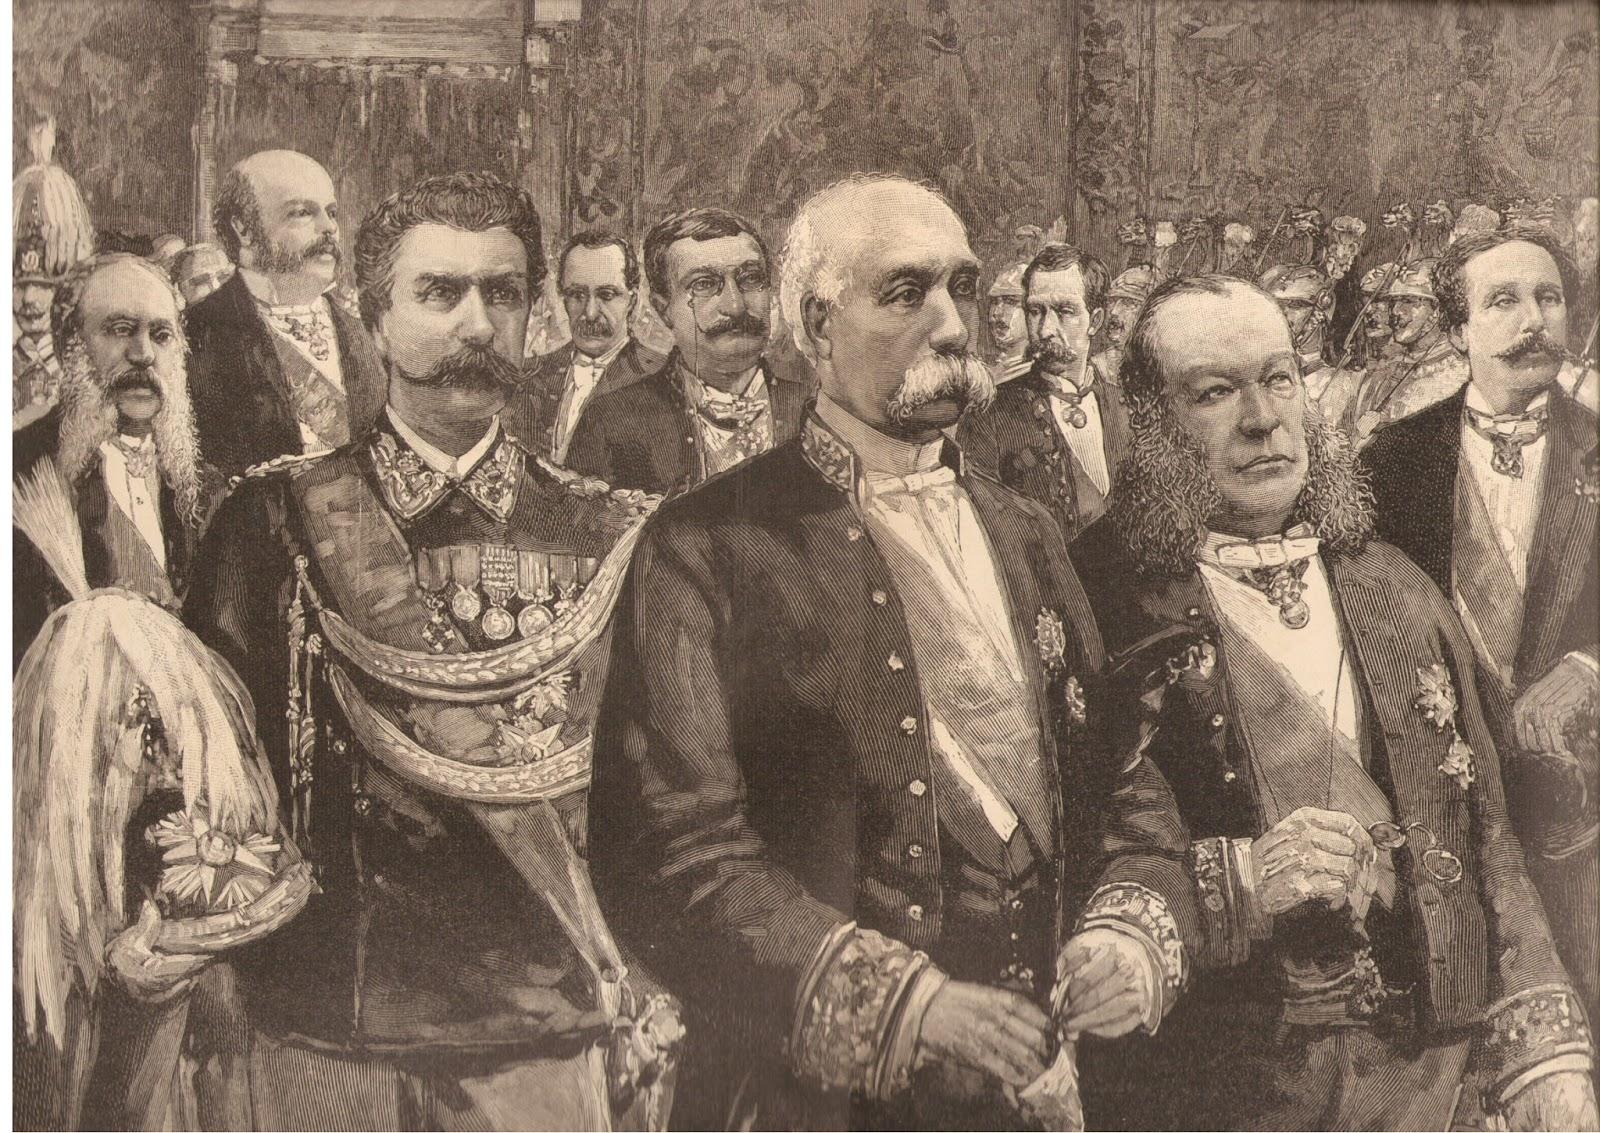 Al centro, Francesco Crispi, tra re e ministri http://2.bp.blogspot.com/-utpPtK6Vc0o/VpKnSMBfMhI/AAAAAAABWlQ/A_QlYrI7vt8/s1600/Crispi_e_ministri_al_Quirinale_nel_capodanno_1888.jpg